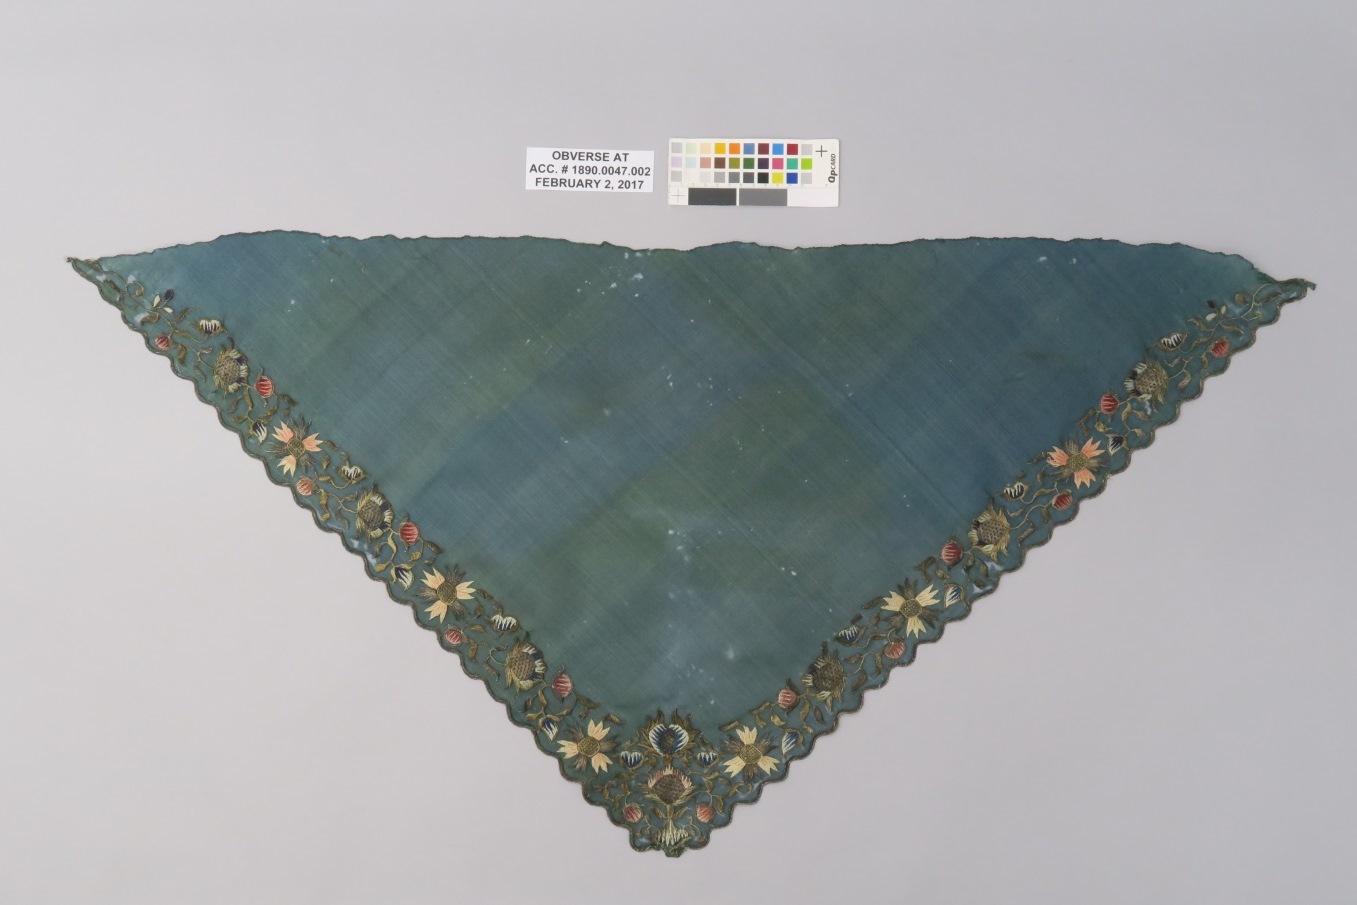 1910.0050.005 after conservation